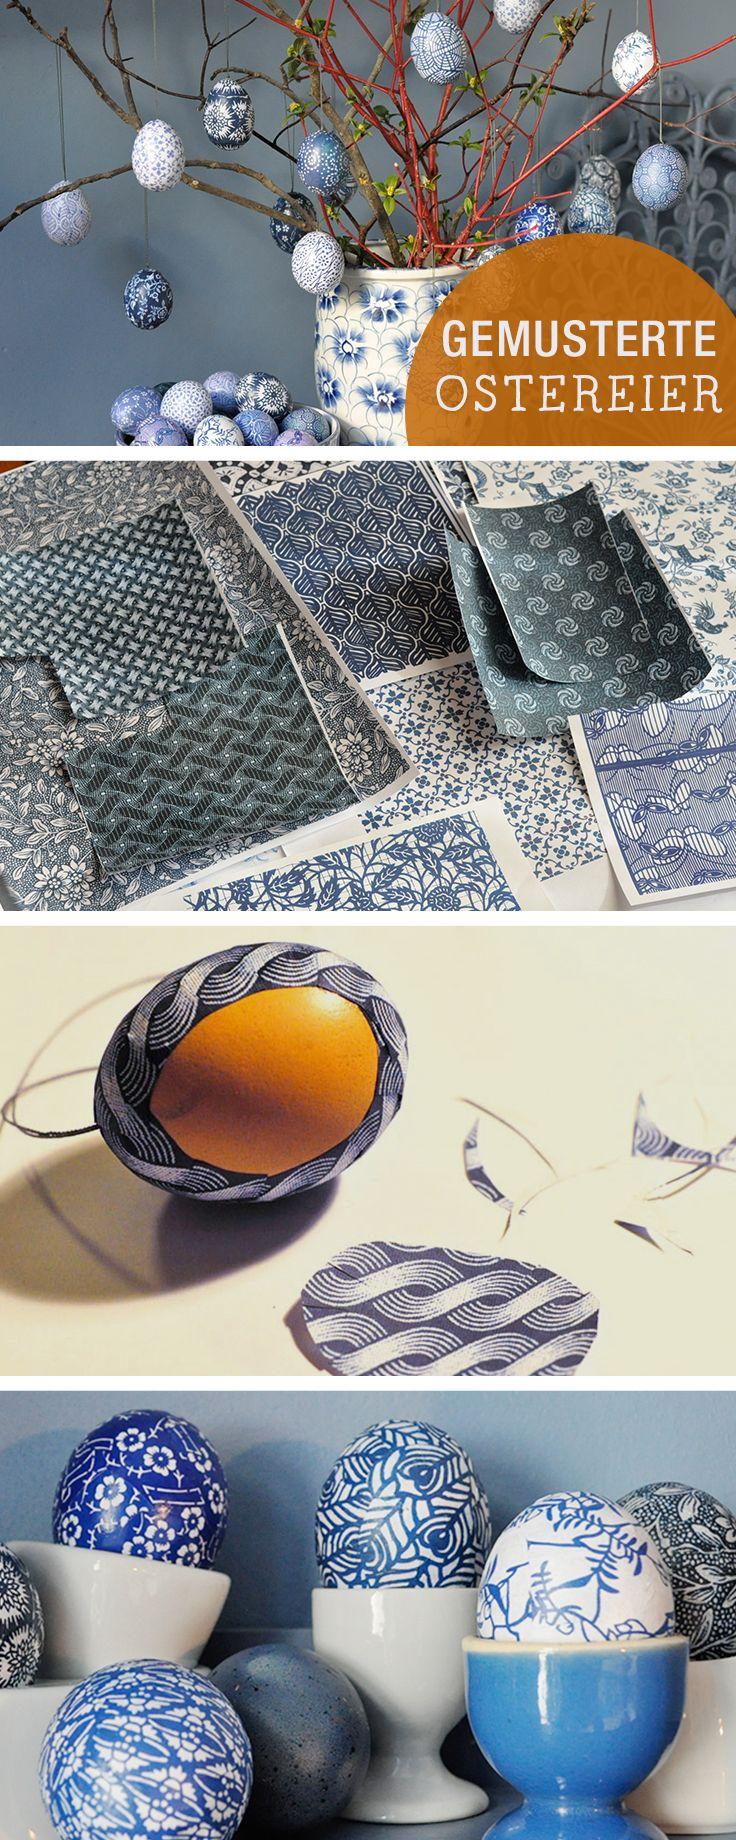 DIY-Anleitung: Gemusterte Ostereier mit Papier herstellen, sorbische Ostereier / diy tutorial: craft coloured easte eggs with different pattern via DaWanda.com